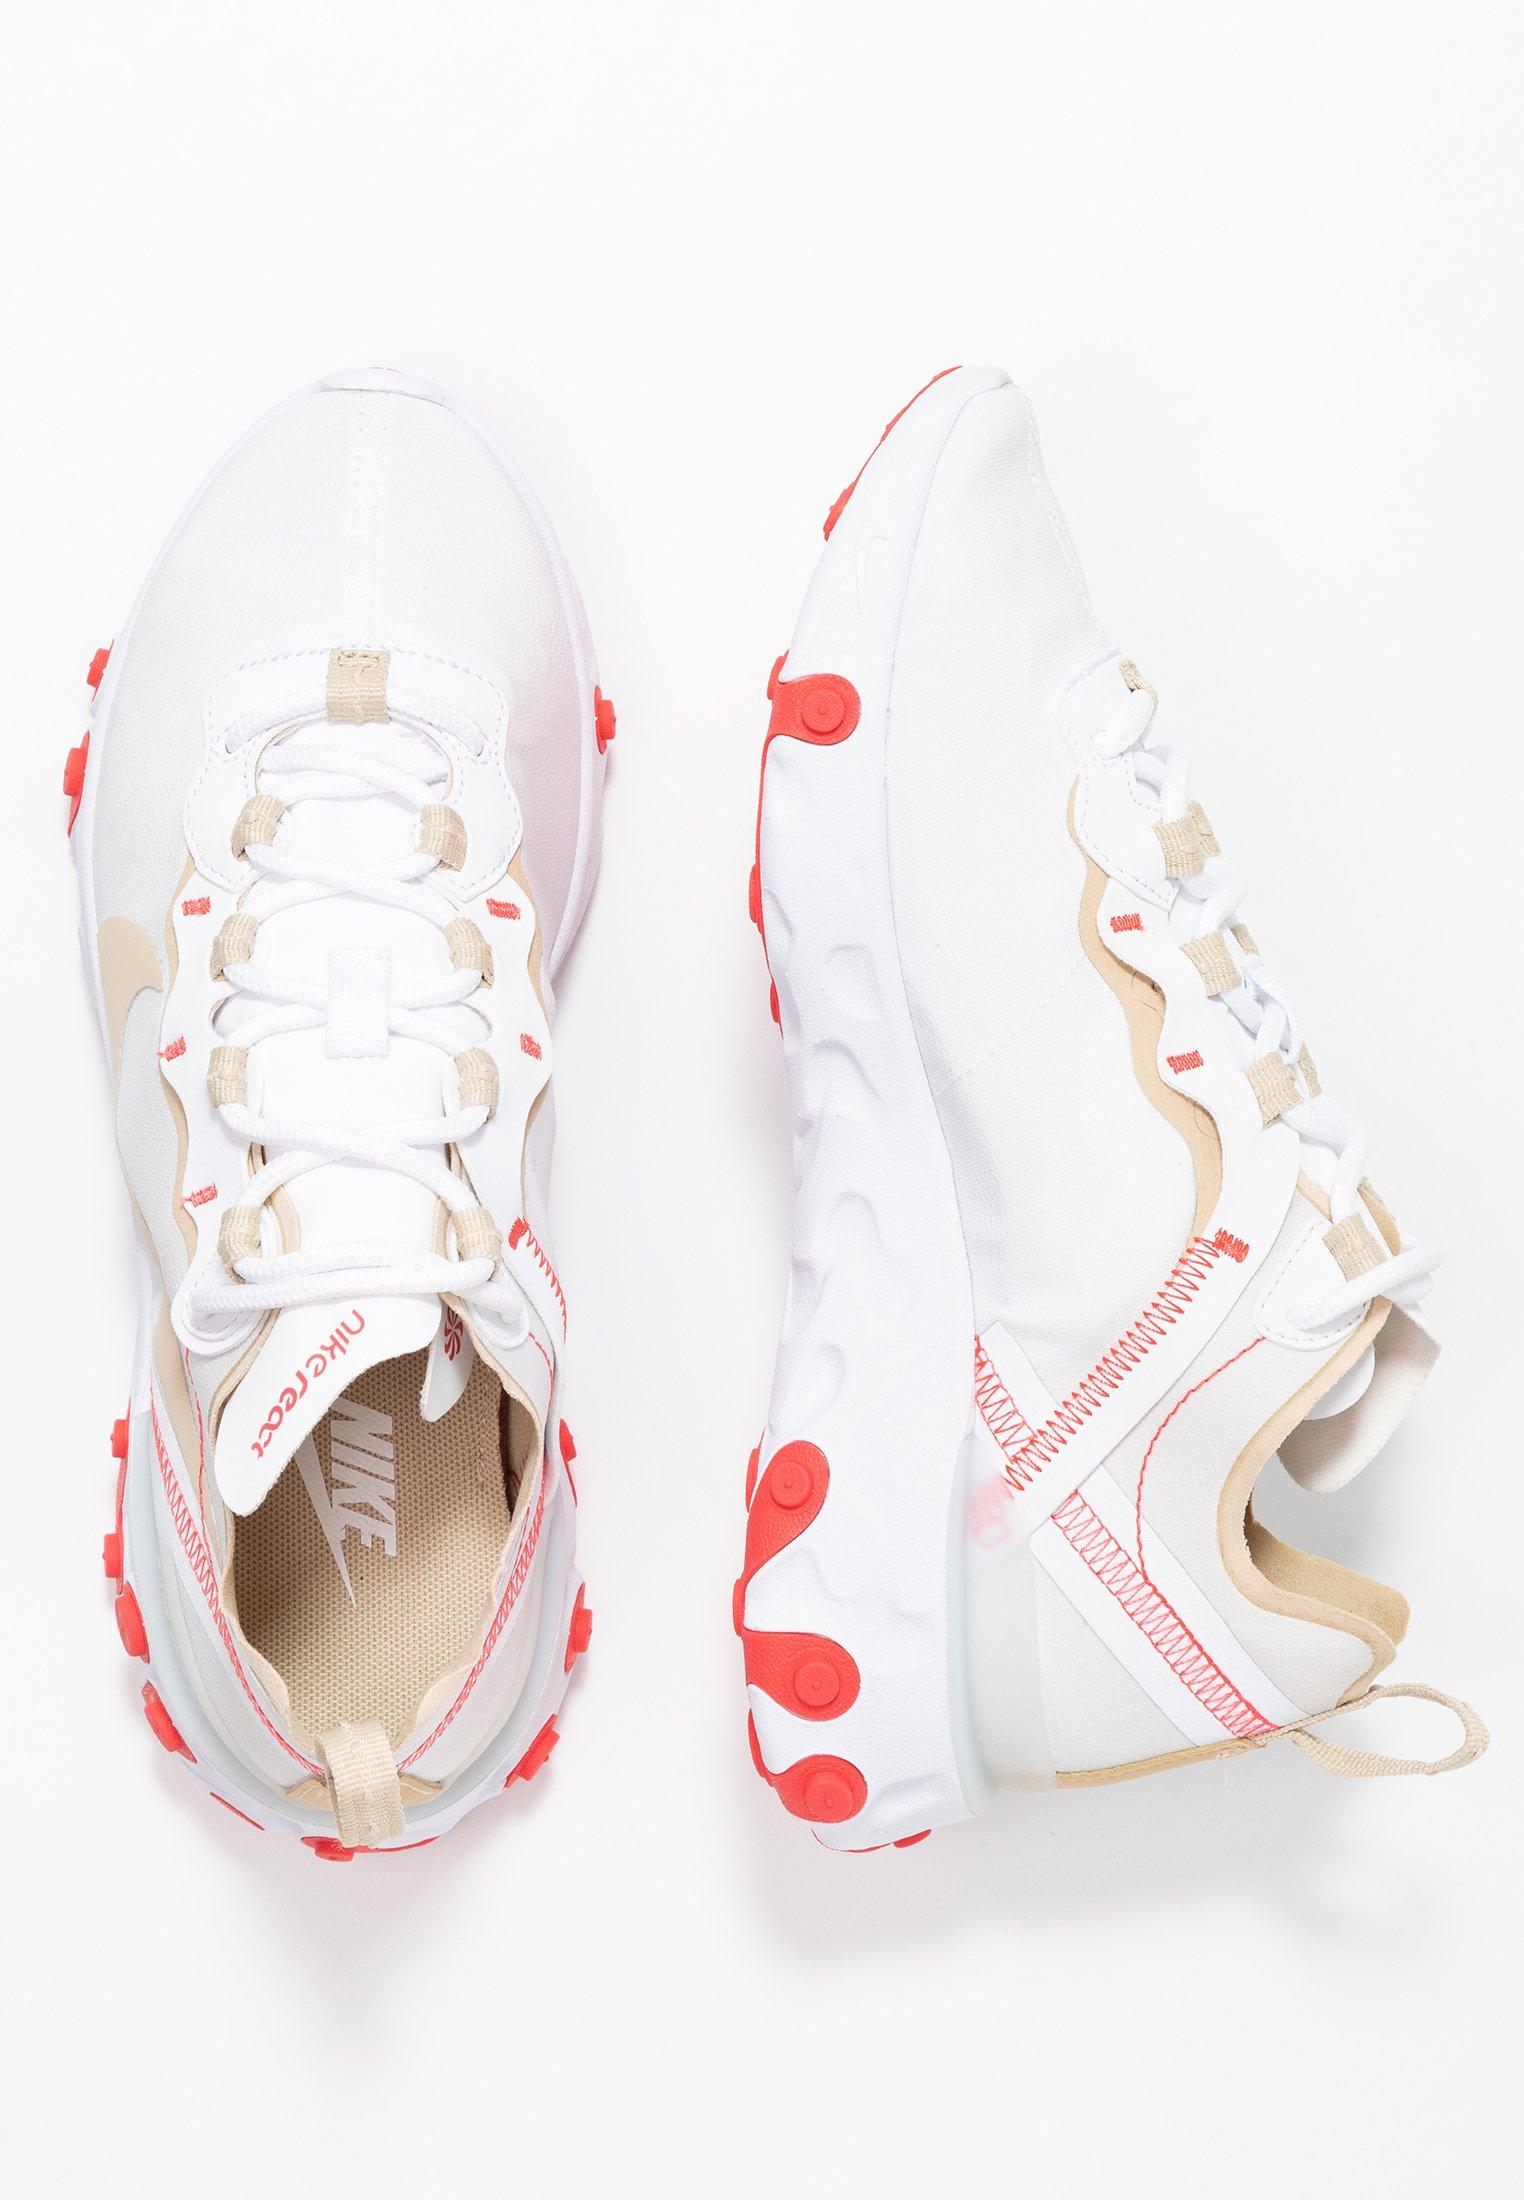 REACT 55 Sneakers whitedesert orewhiteember glow